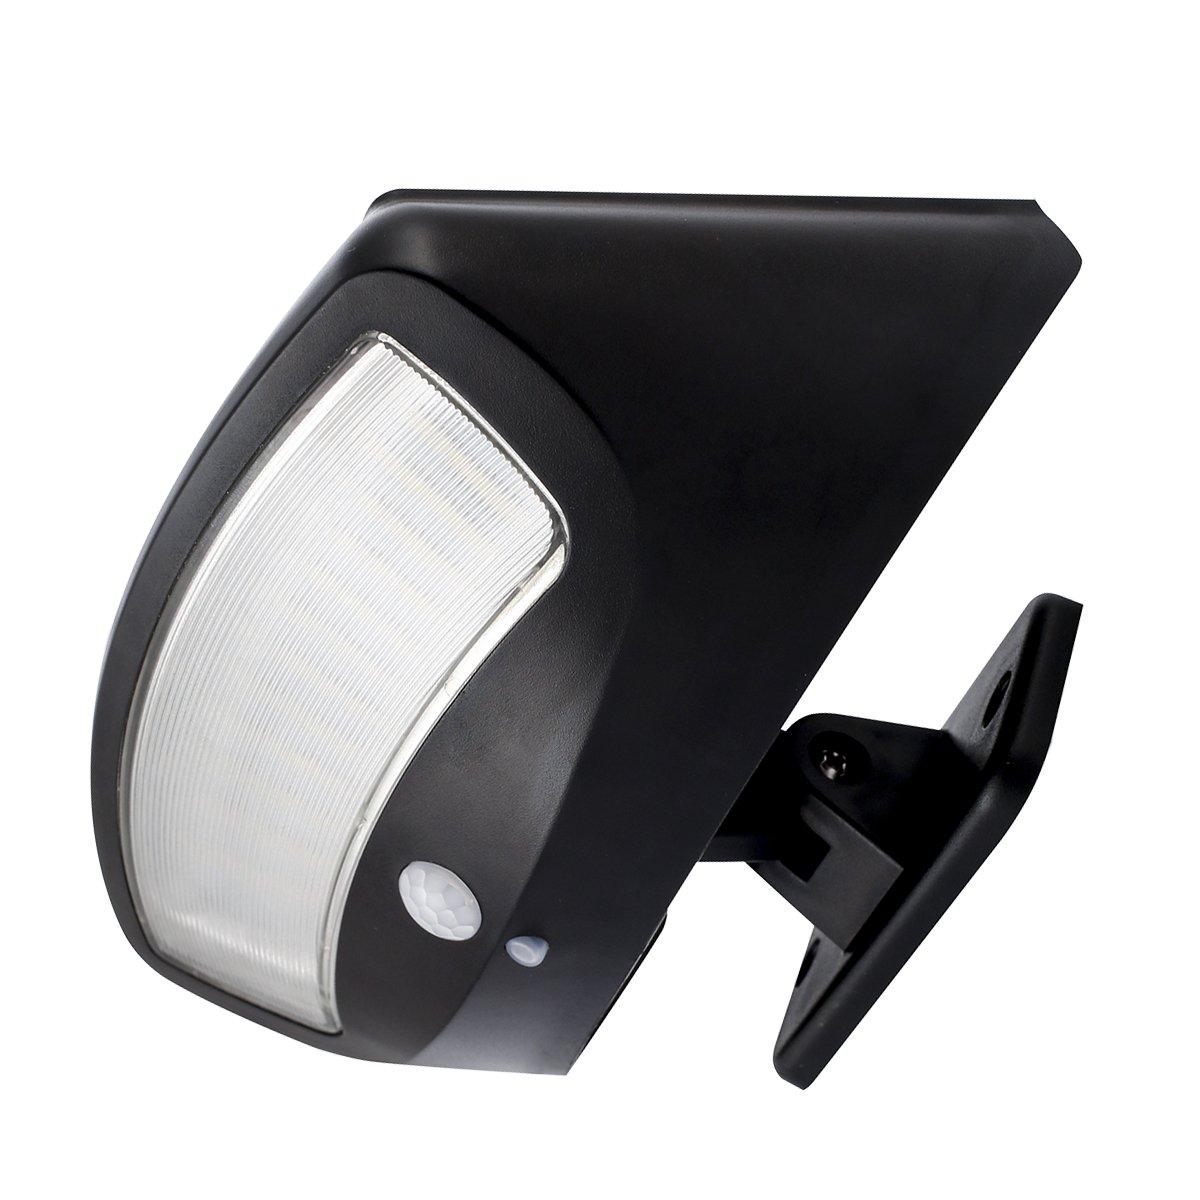 Solar Lights Outdoor Motion Sensor Security Lights, Super Bright 36 LED 600 lm,4 Mode Wireless Waterproof Solar Powered Flood Lights Wall Lights for Patio,Driveway, Garden (Black, 1 Pack)